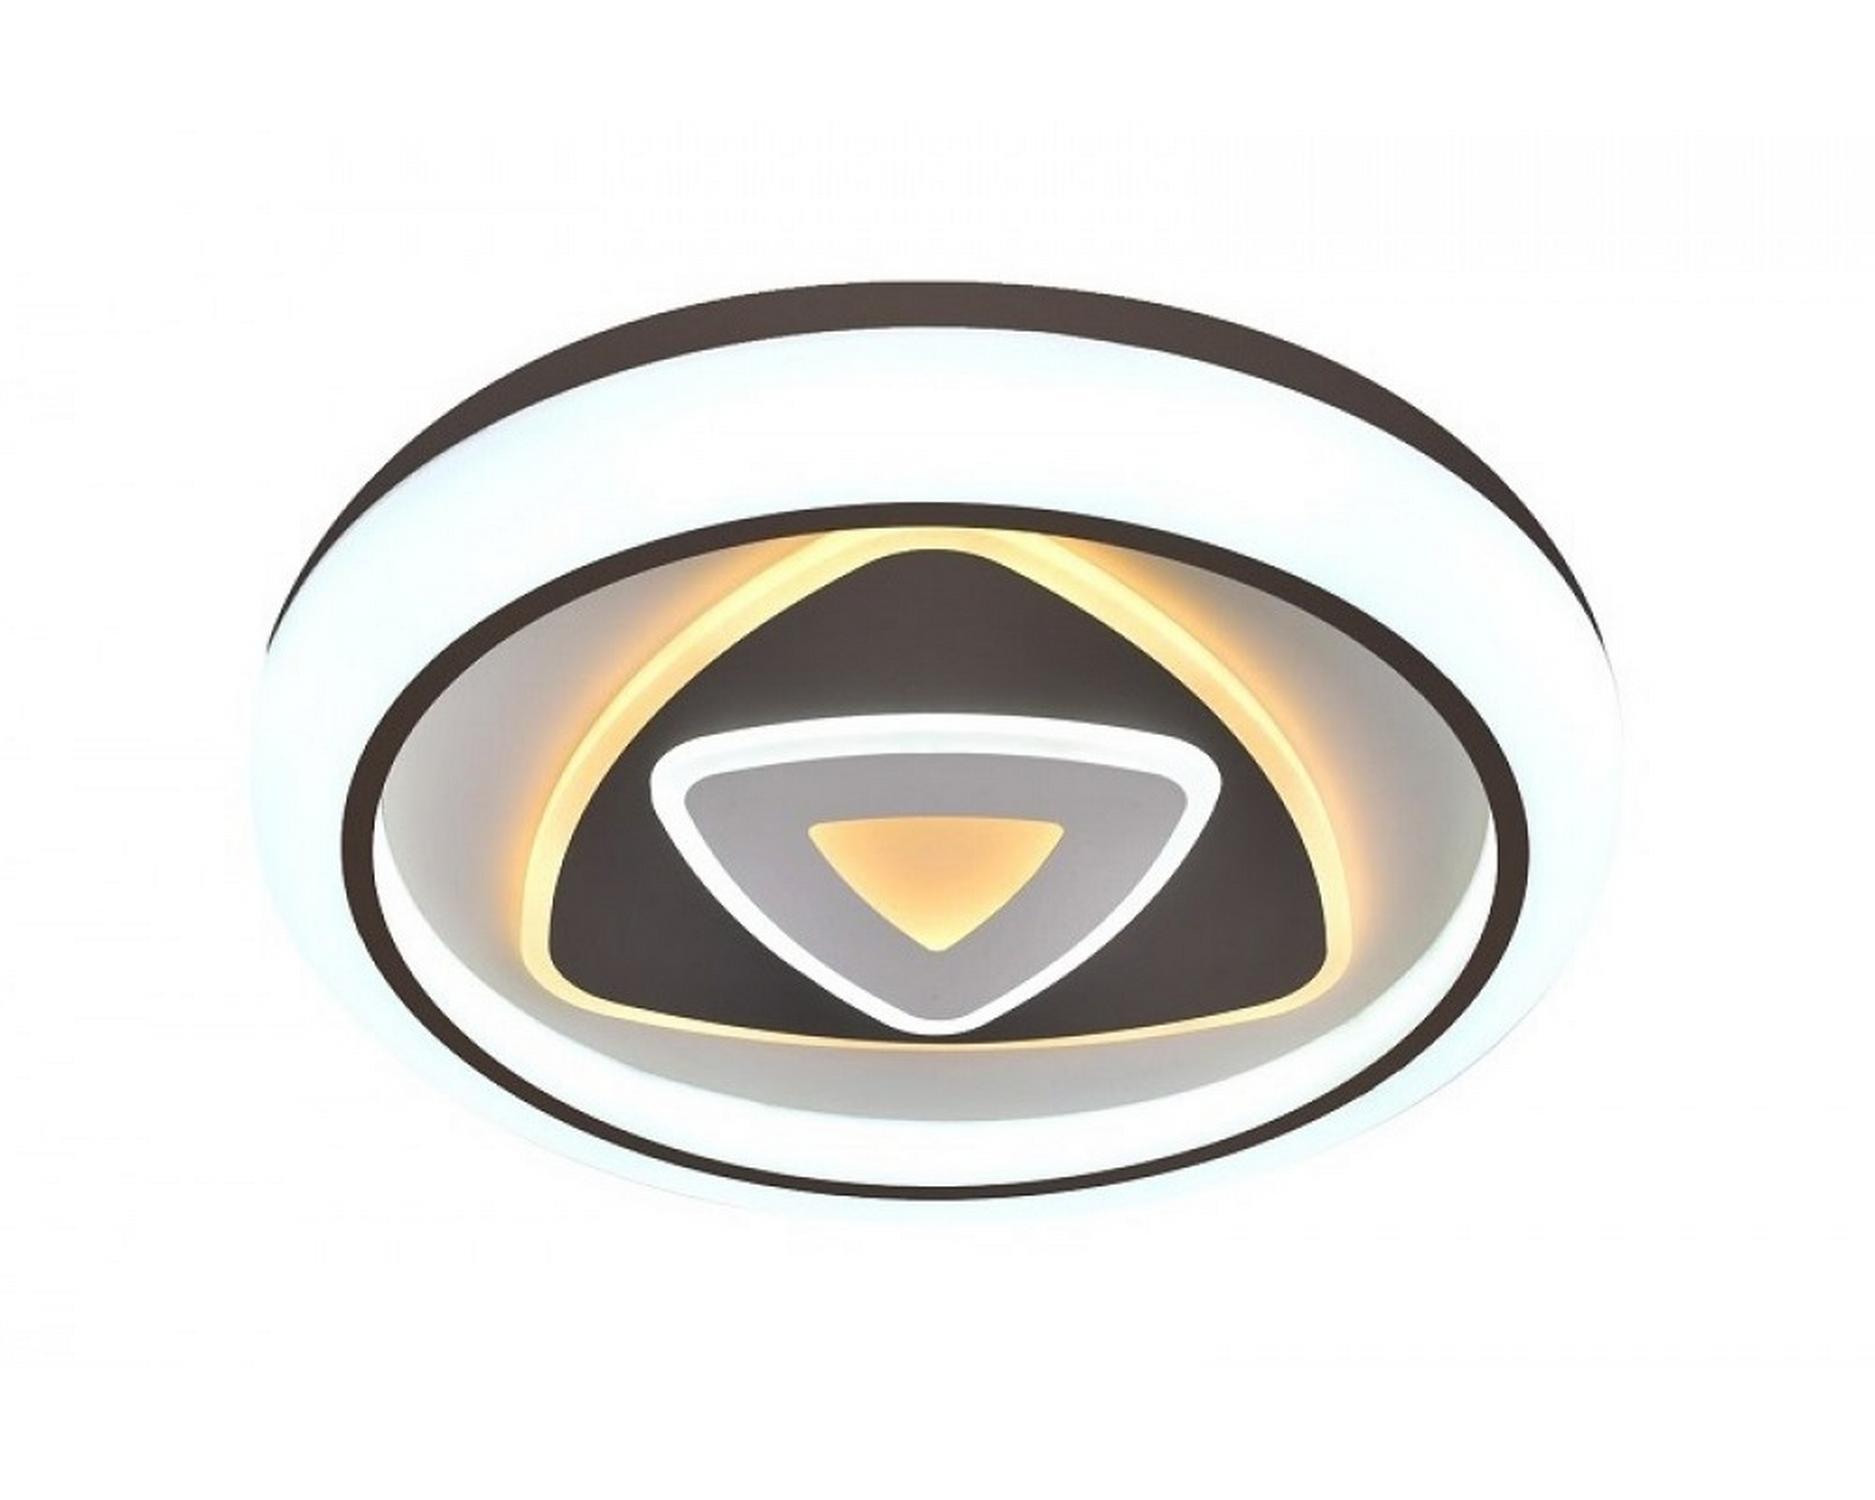 General 140 WT GSMCL Smart LED Chandelier Lamp Illuminator Ceiling Adjustable Lighting Living Room Bedroom Kitchen Plafond